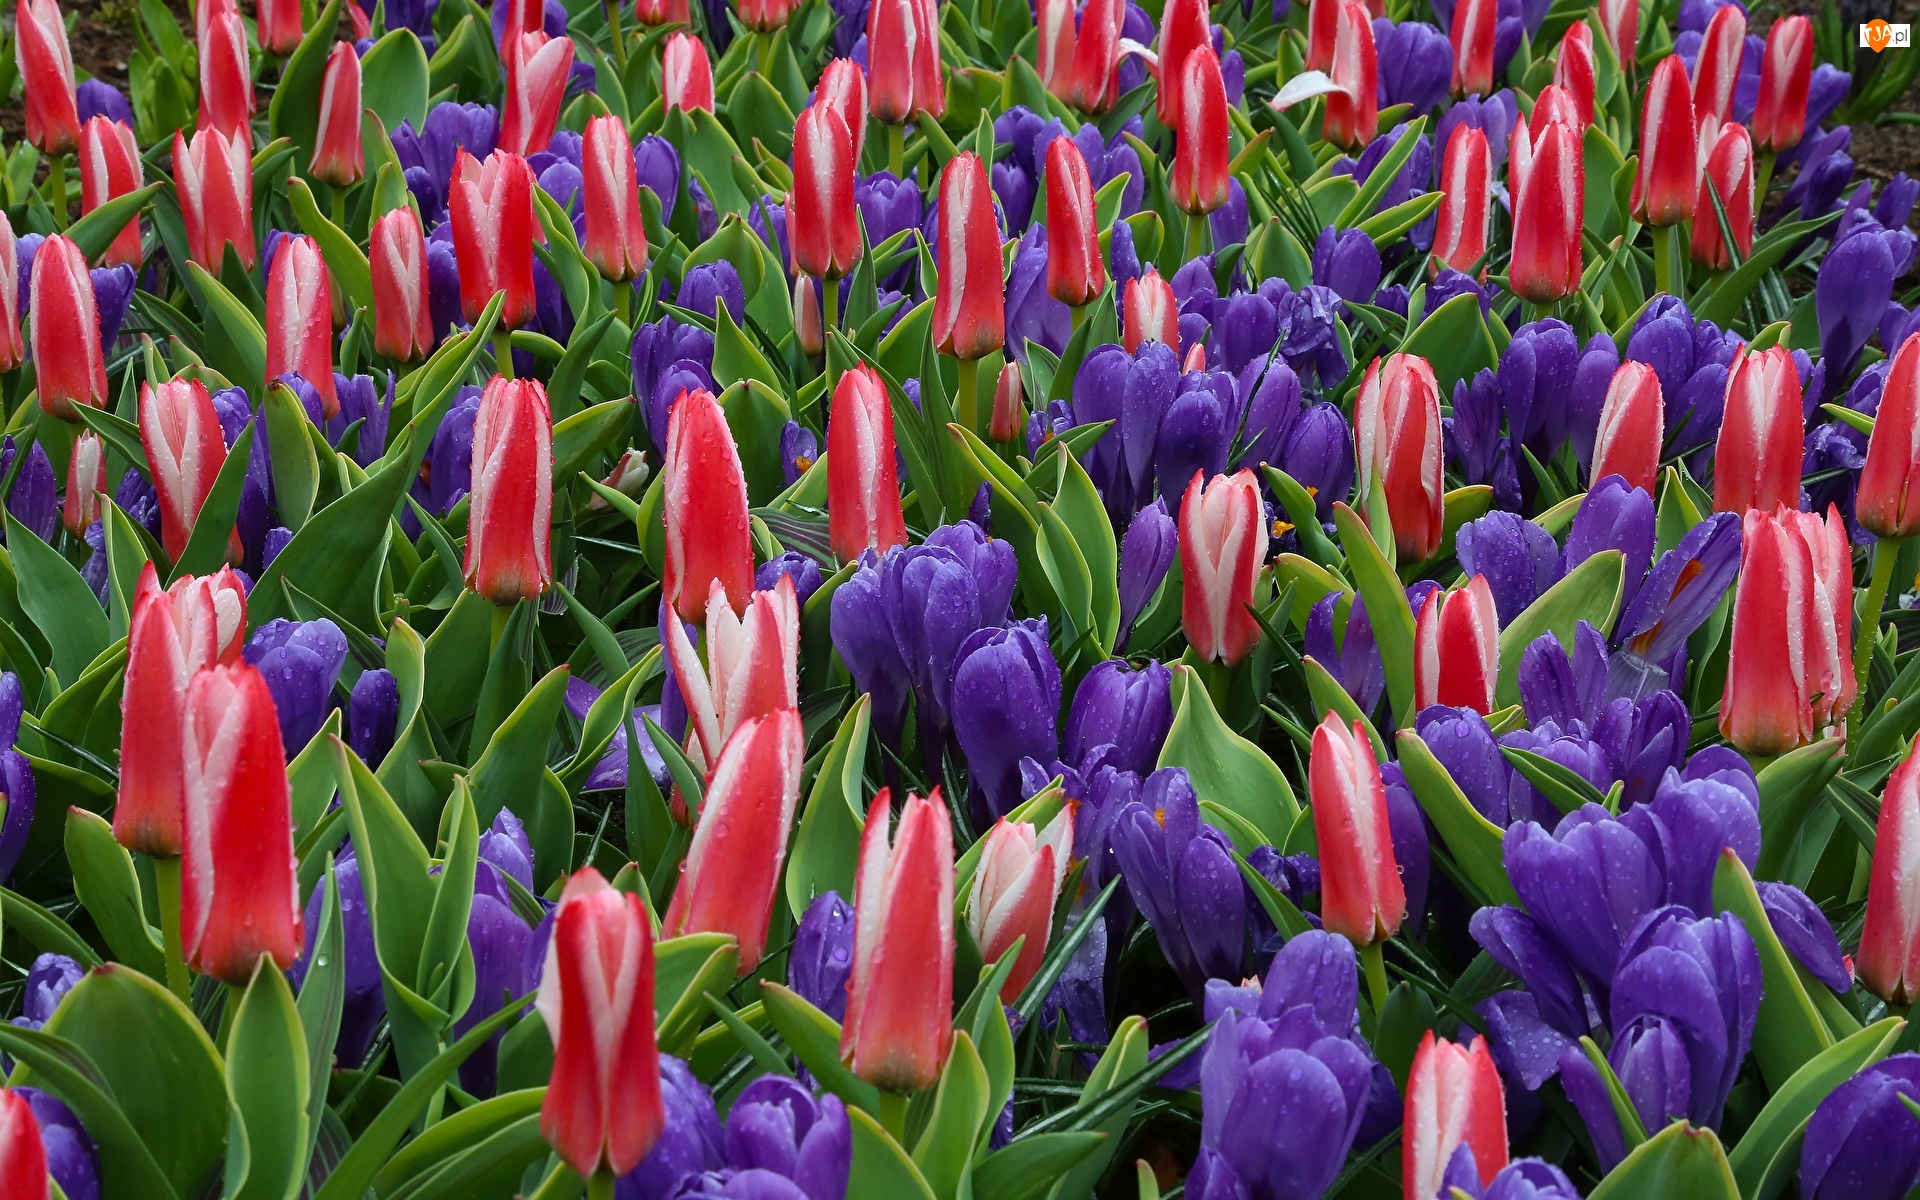 Tulipany, Krople, Kolorowe, Kwiaty, Krokusy